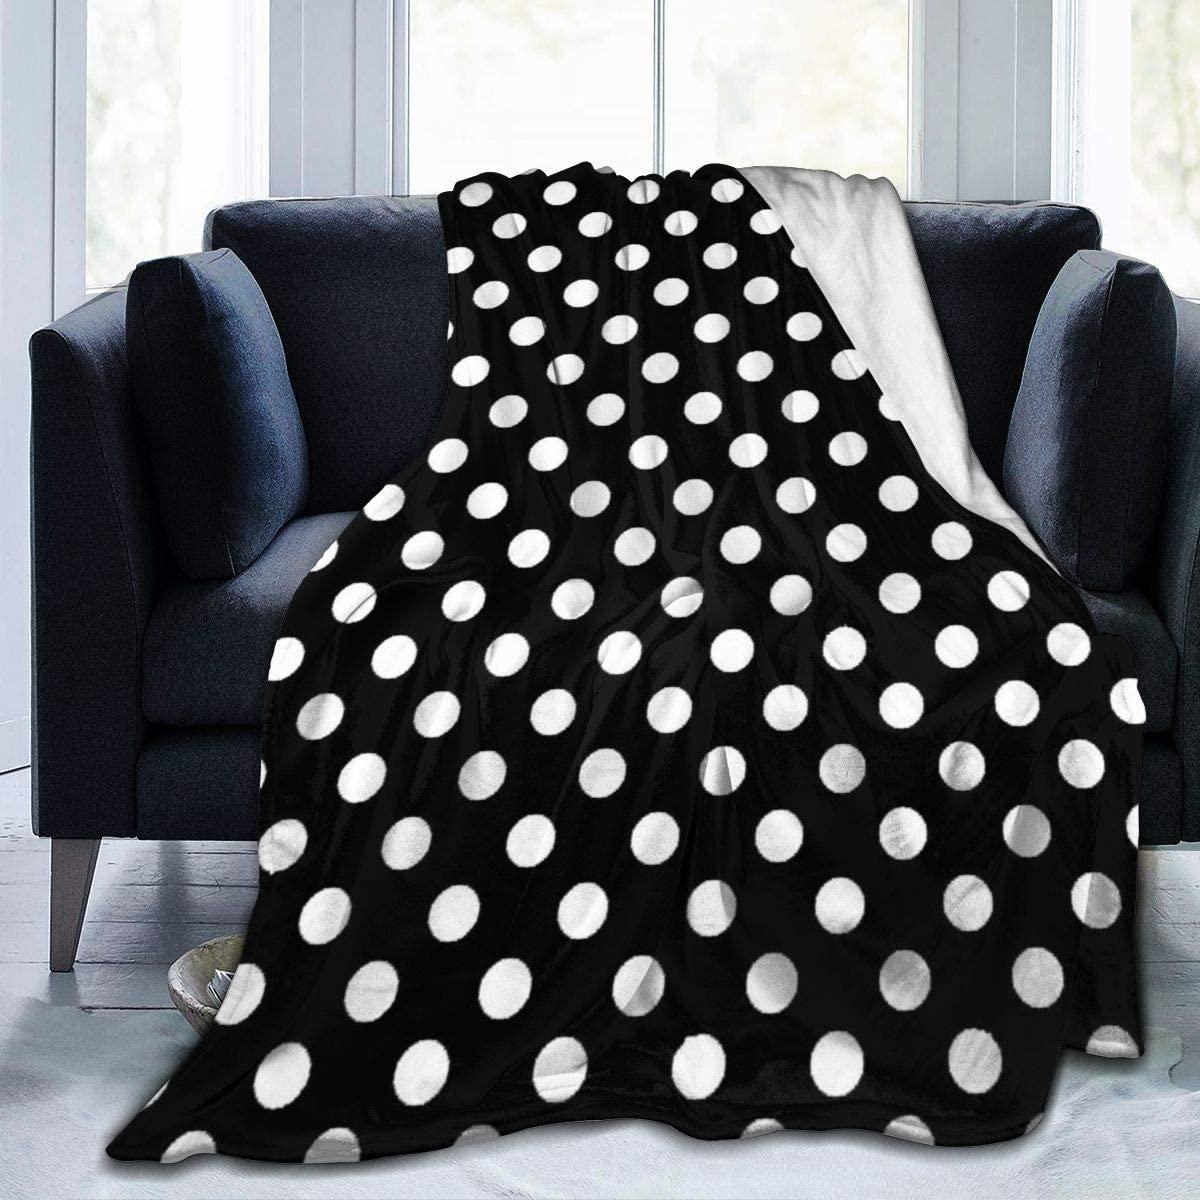 Micro Fleece Plush Soft Baby Blanket White Dots On Black Fluffy Warm Toddler Bed/Crib Blanket Lightweight Flannel Daycare Nap Kids Sleeping Tummy Time Throw Blanket Girls Boy Clearance Kid/Baby